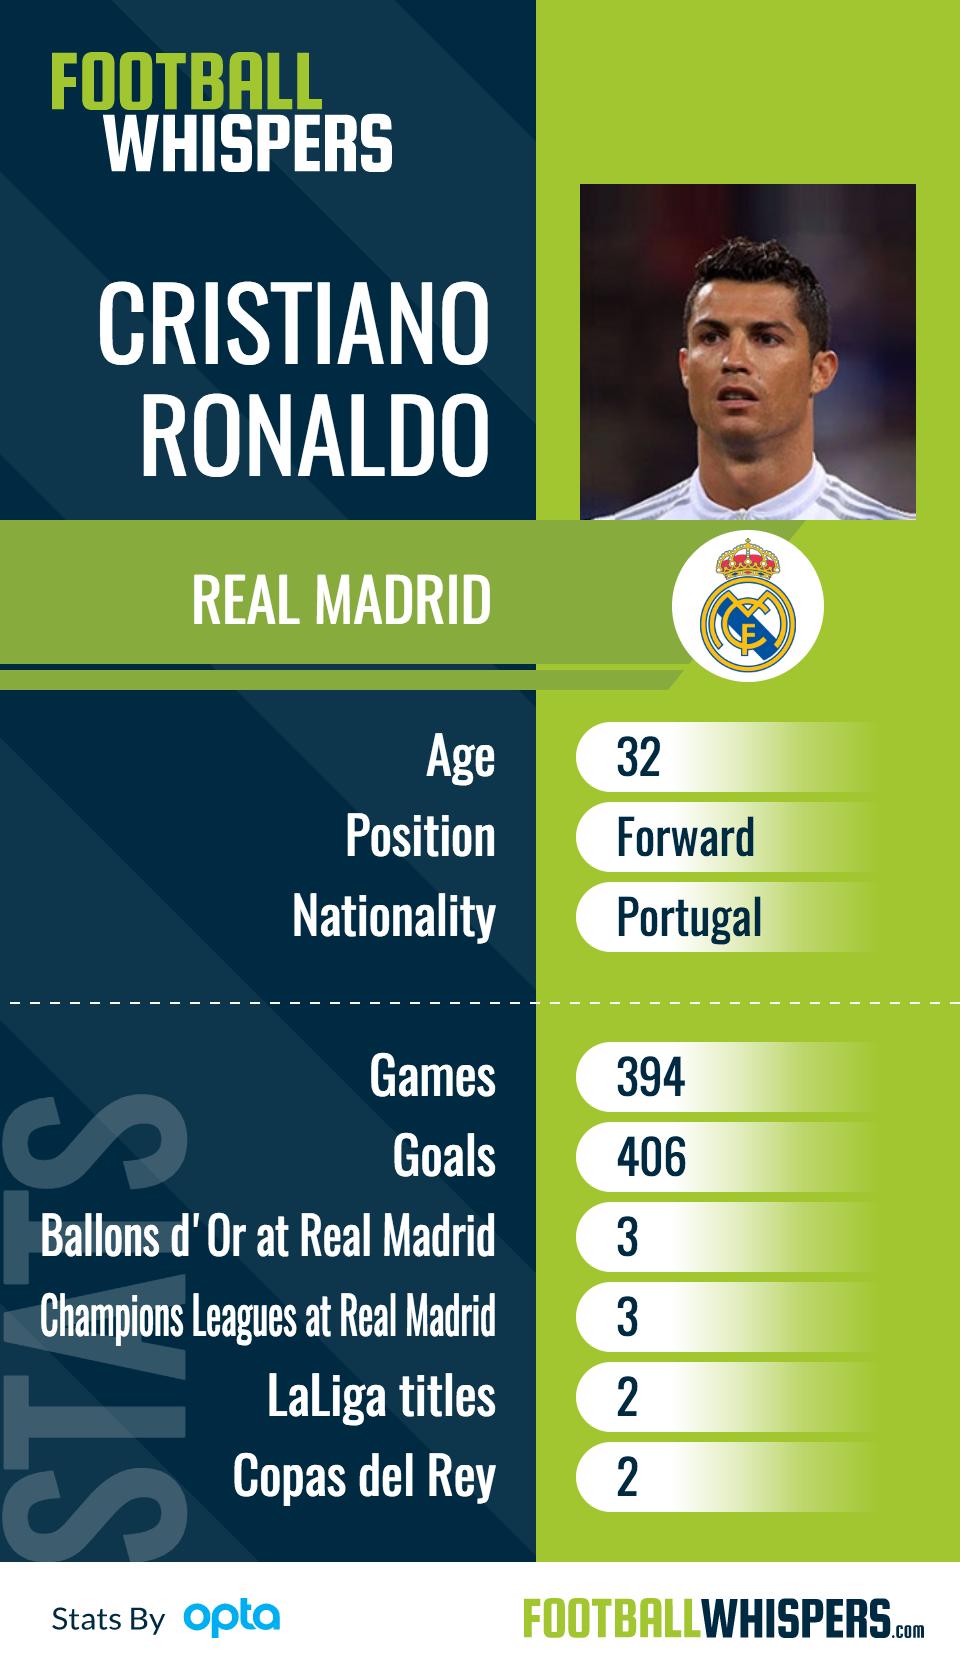 Cristiano Ronaldo player card